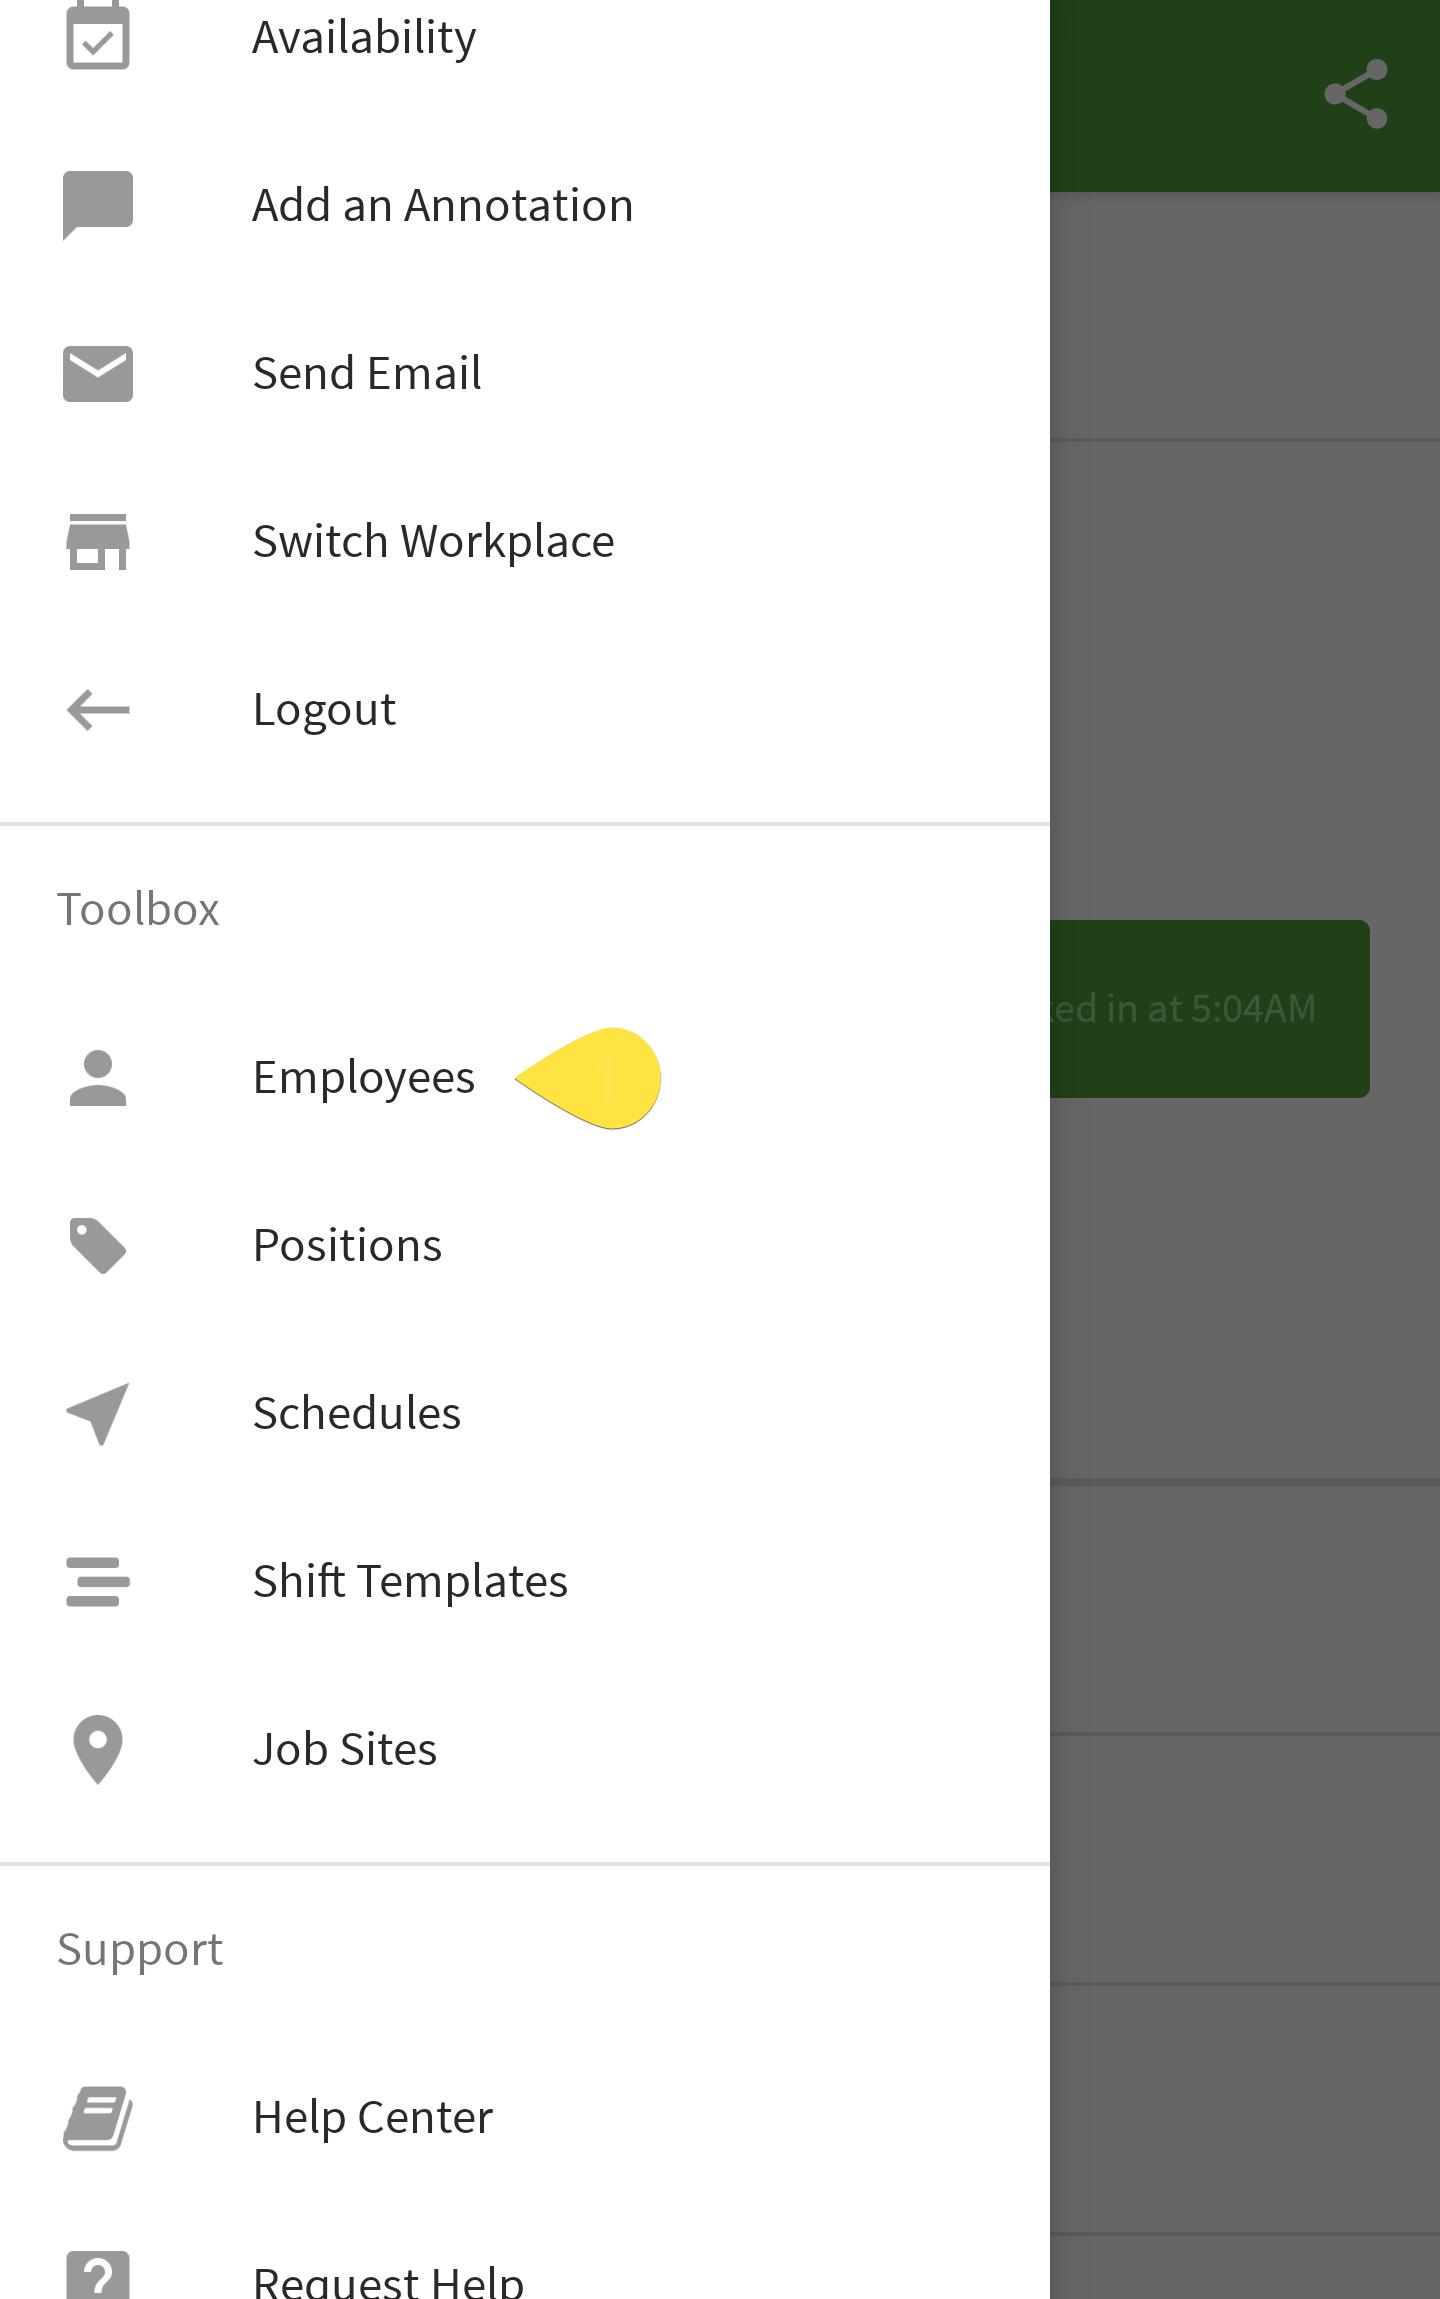 Employees menu option